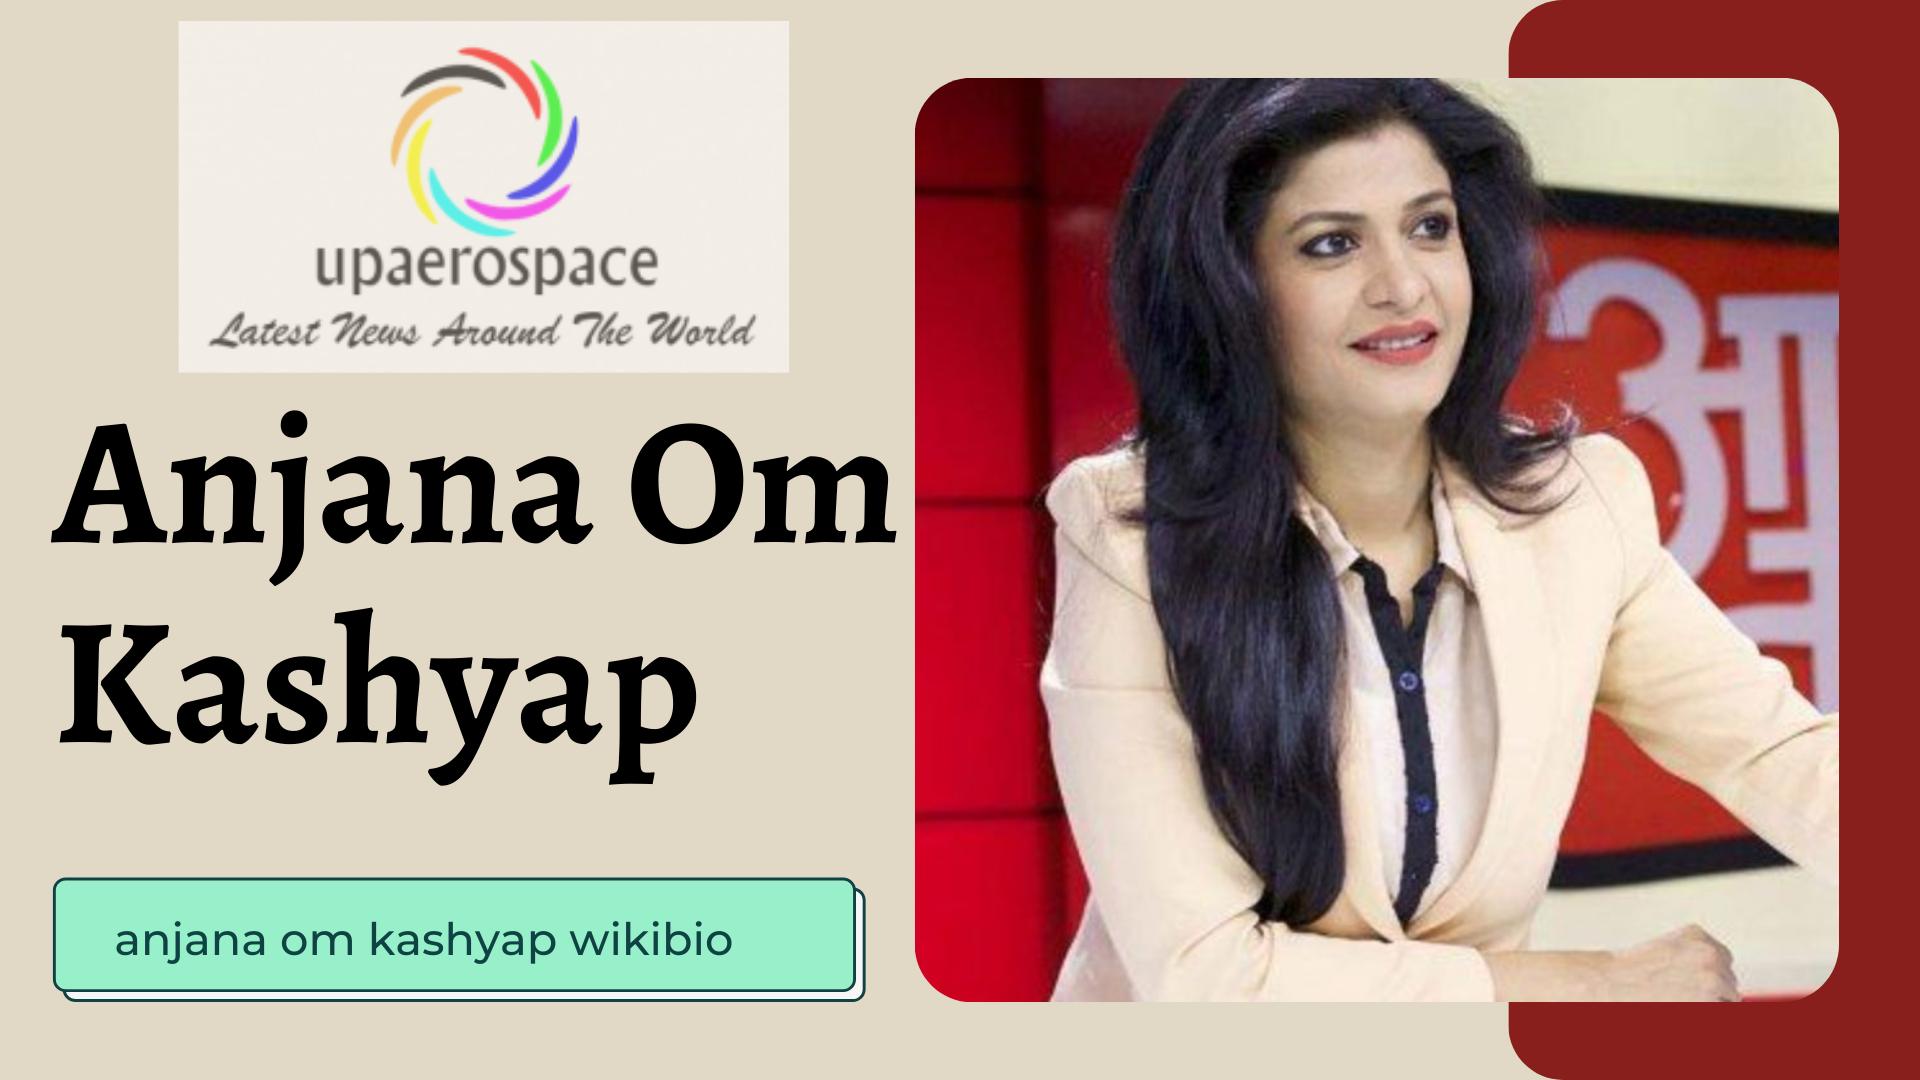 Anjana Om Kashyap Age, Husband, Family, Salary, Education, wikibio